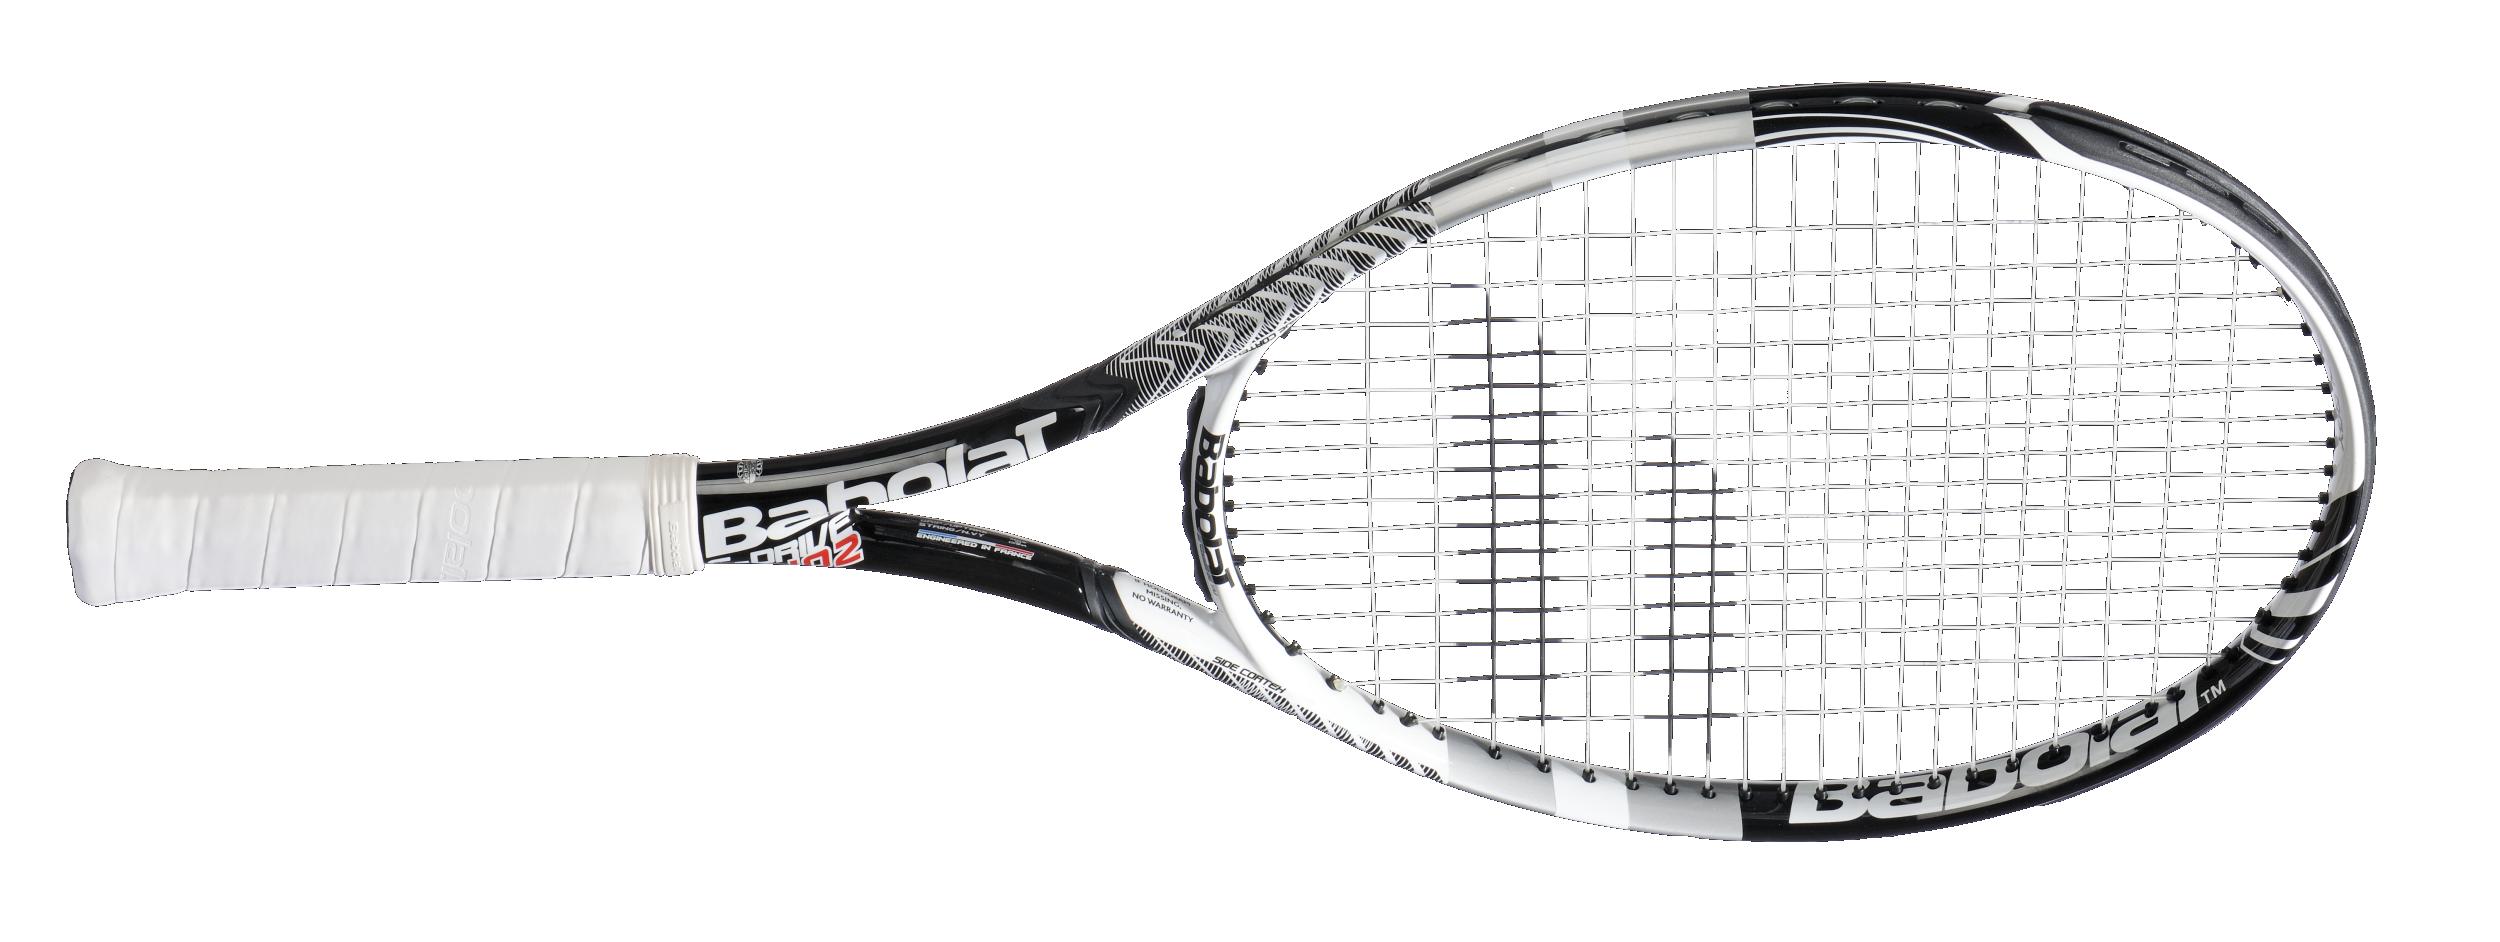 Tennis Racket Png Image Tennis Racket Tennis Rackets